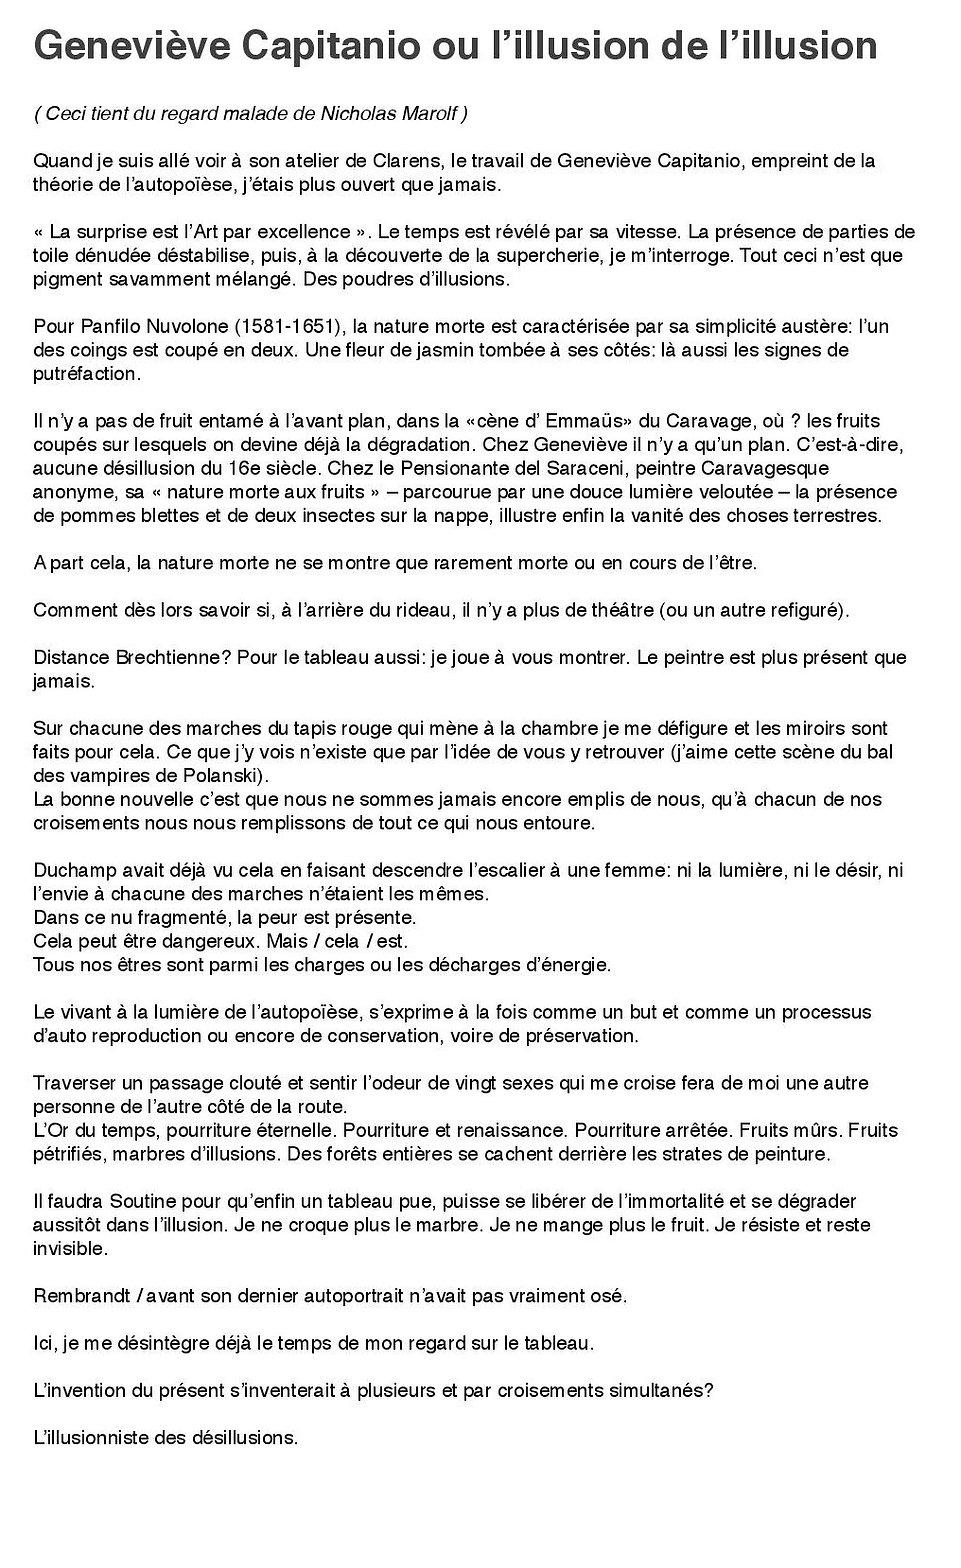 Expo Capitanio_Texte Nicholas Marolf_1.j